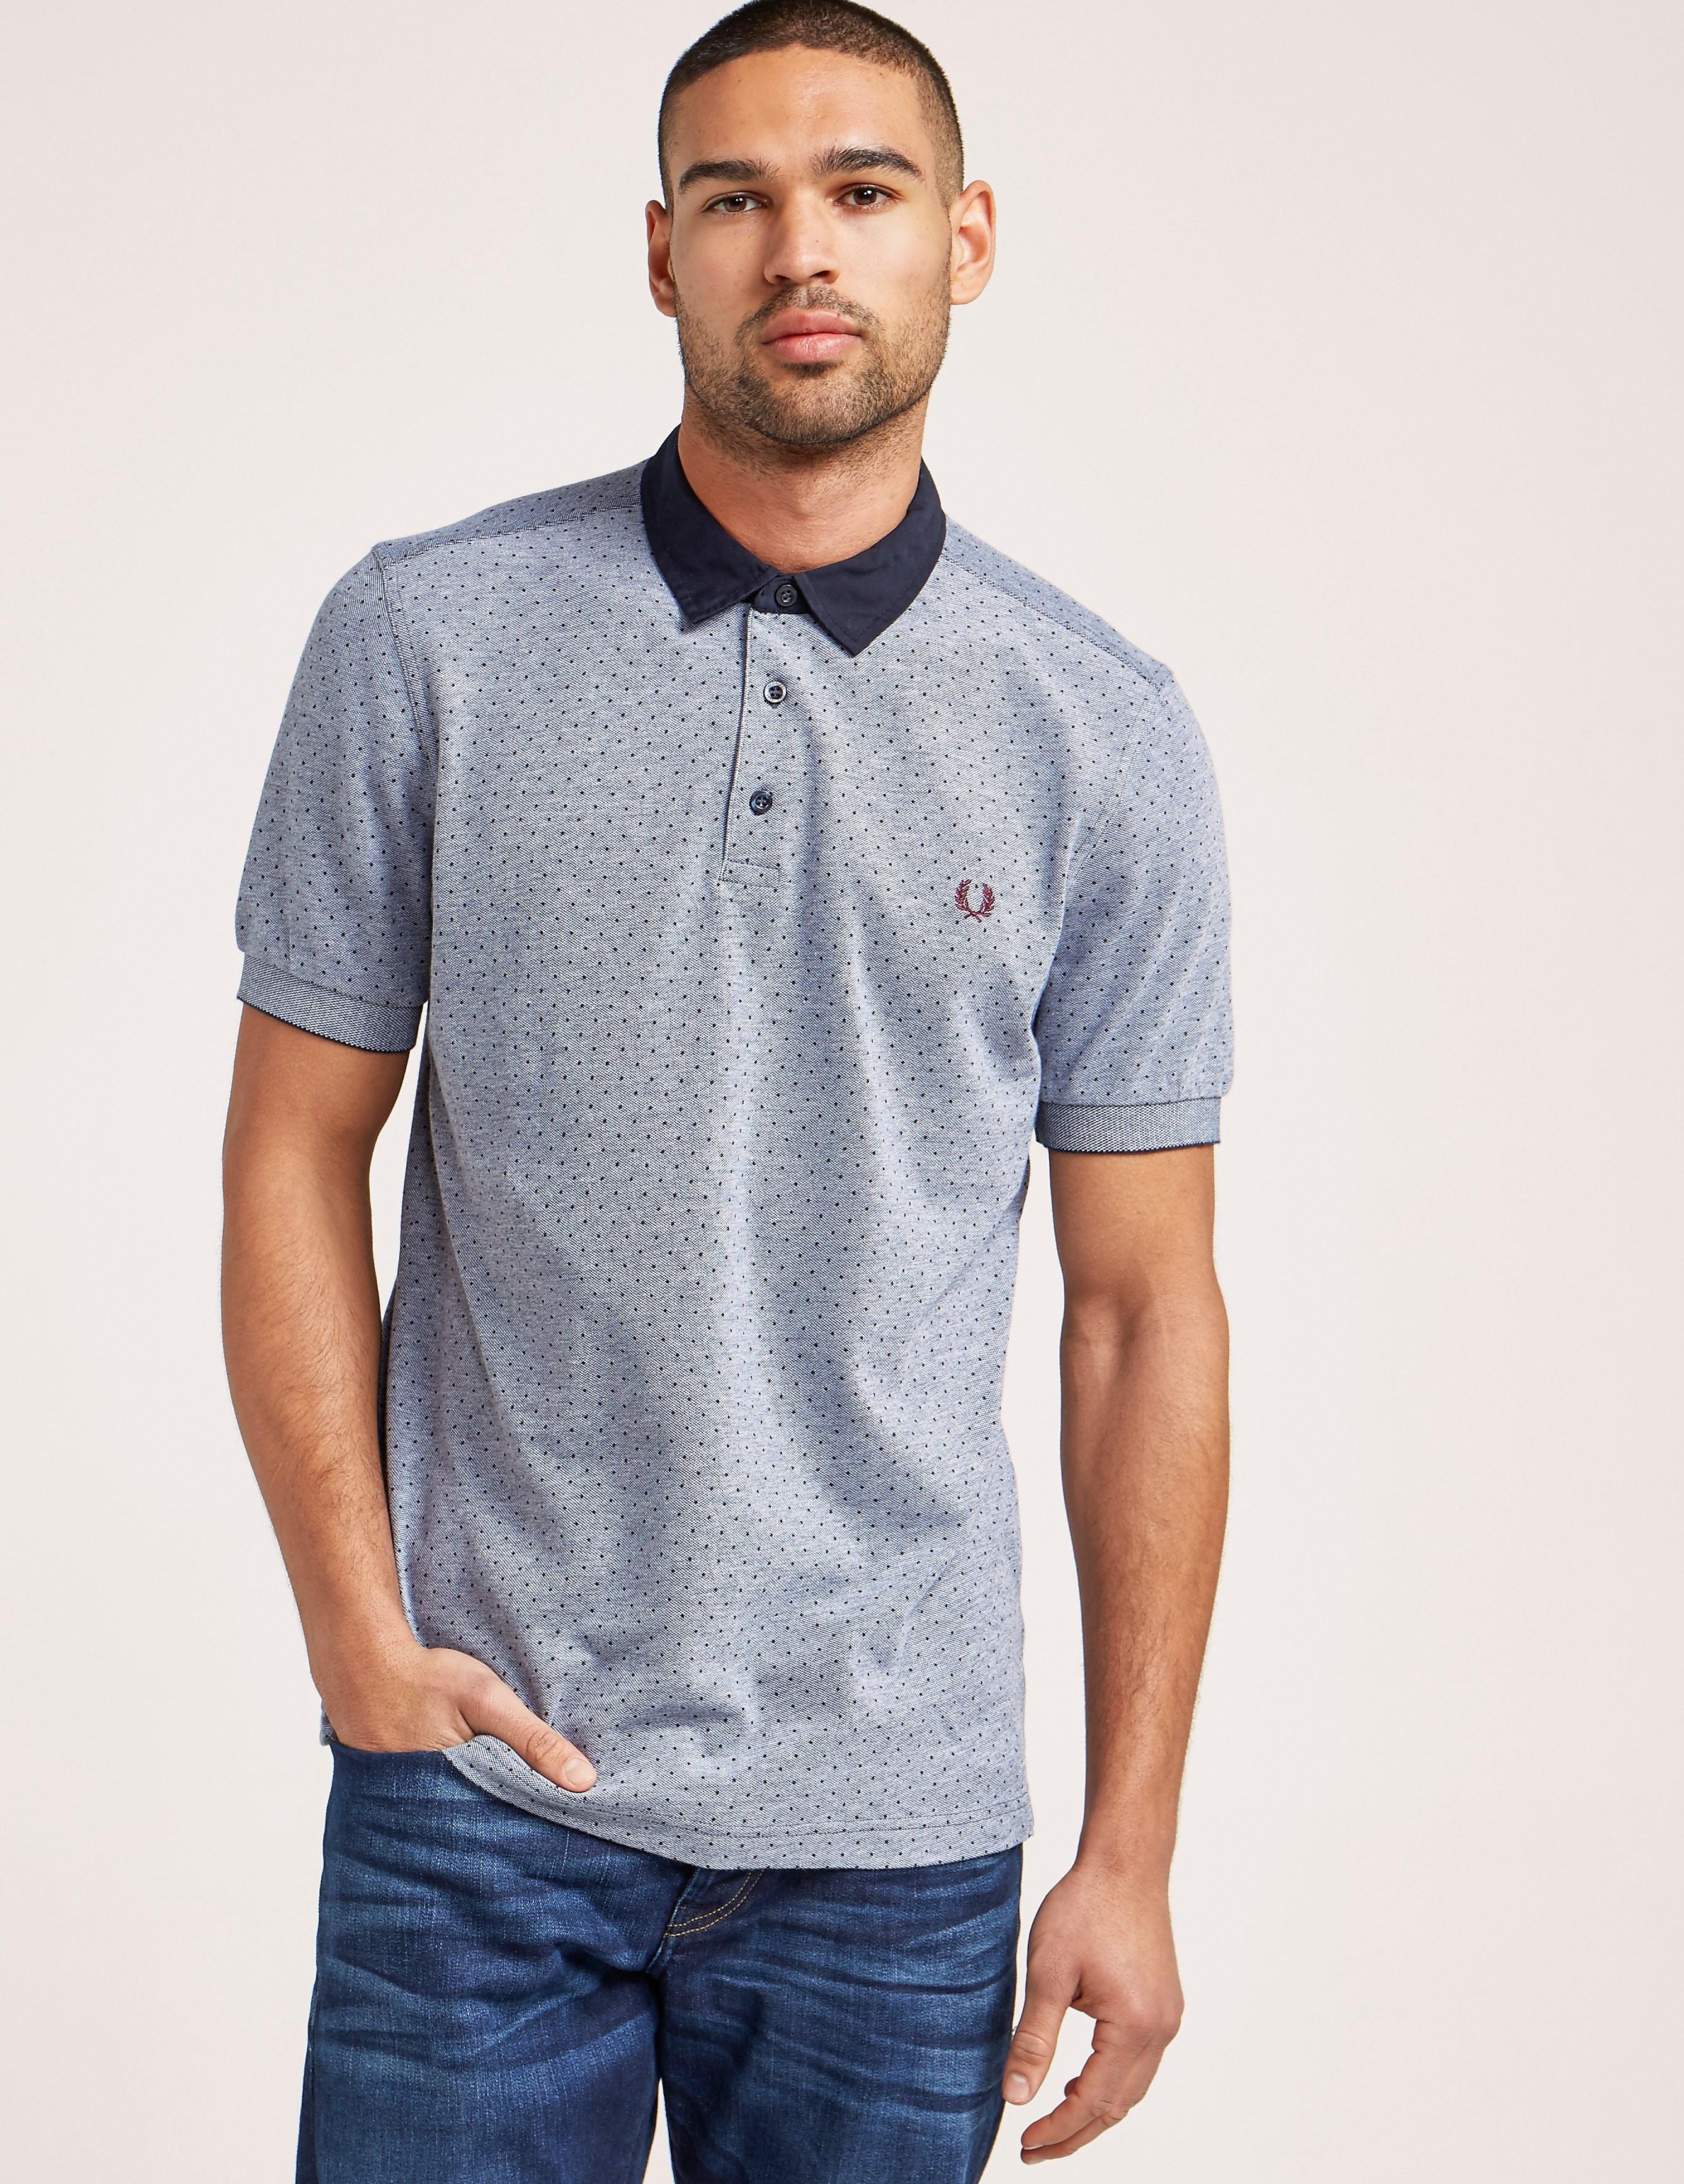 Fred Perry Polka Dot Polo Shirt